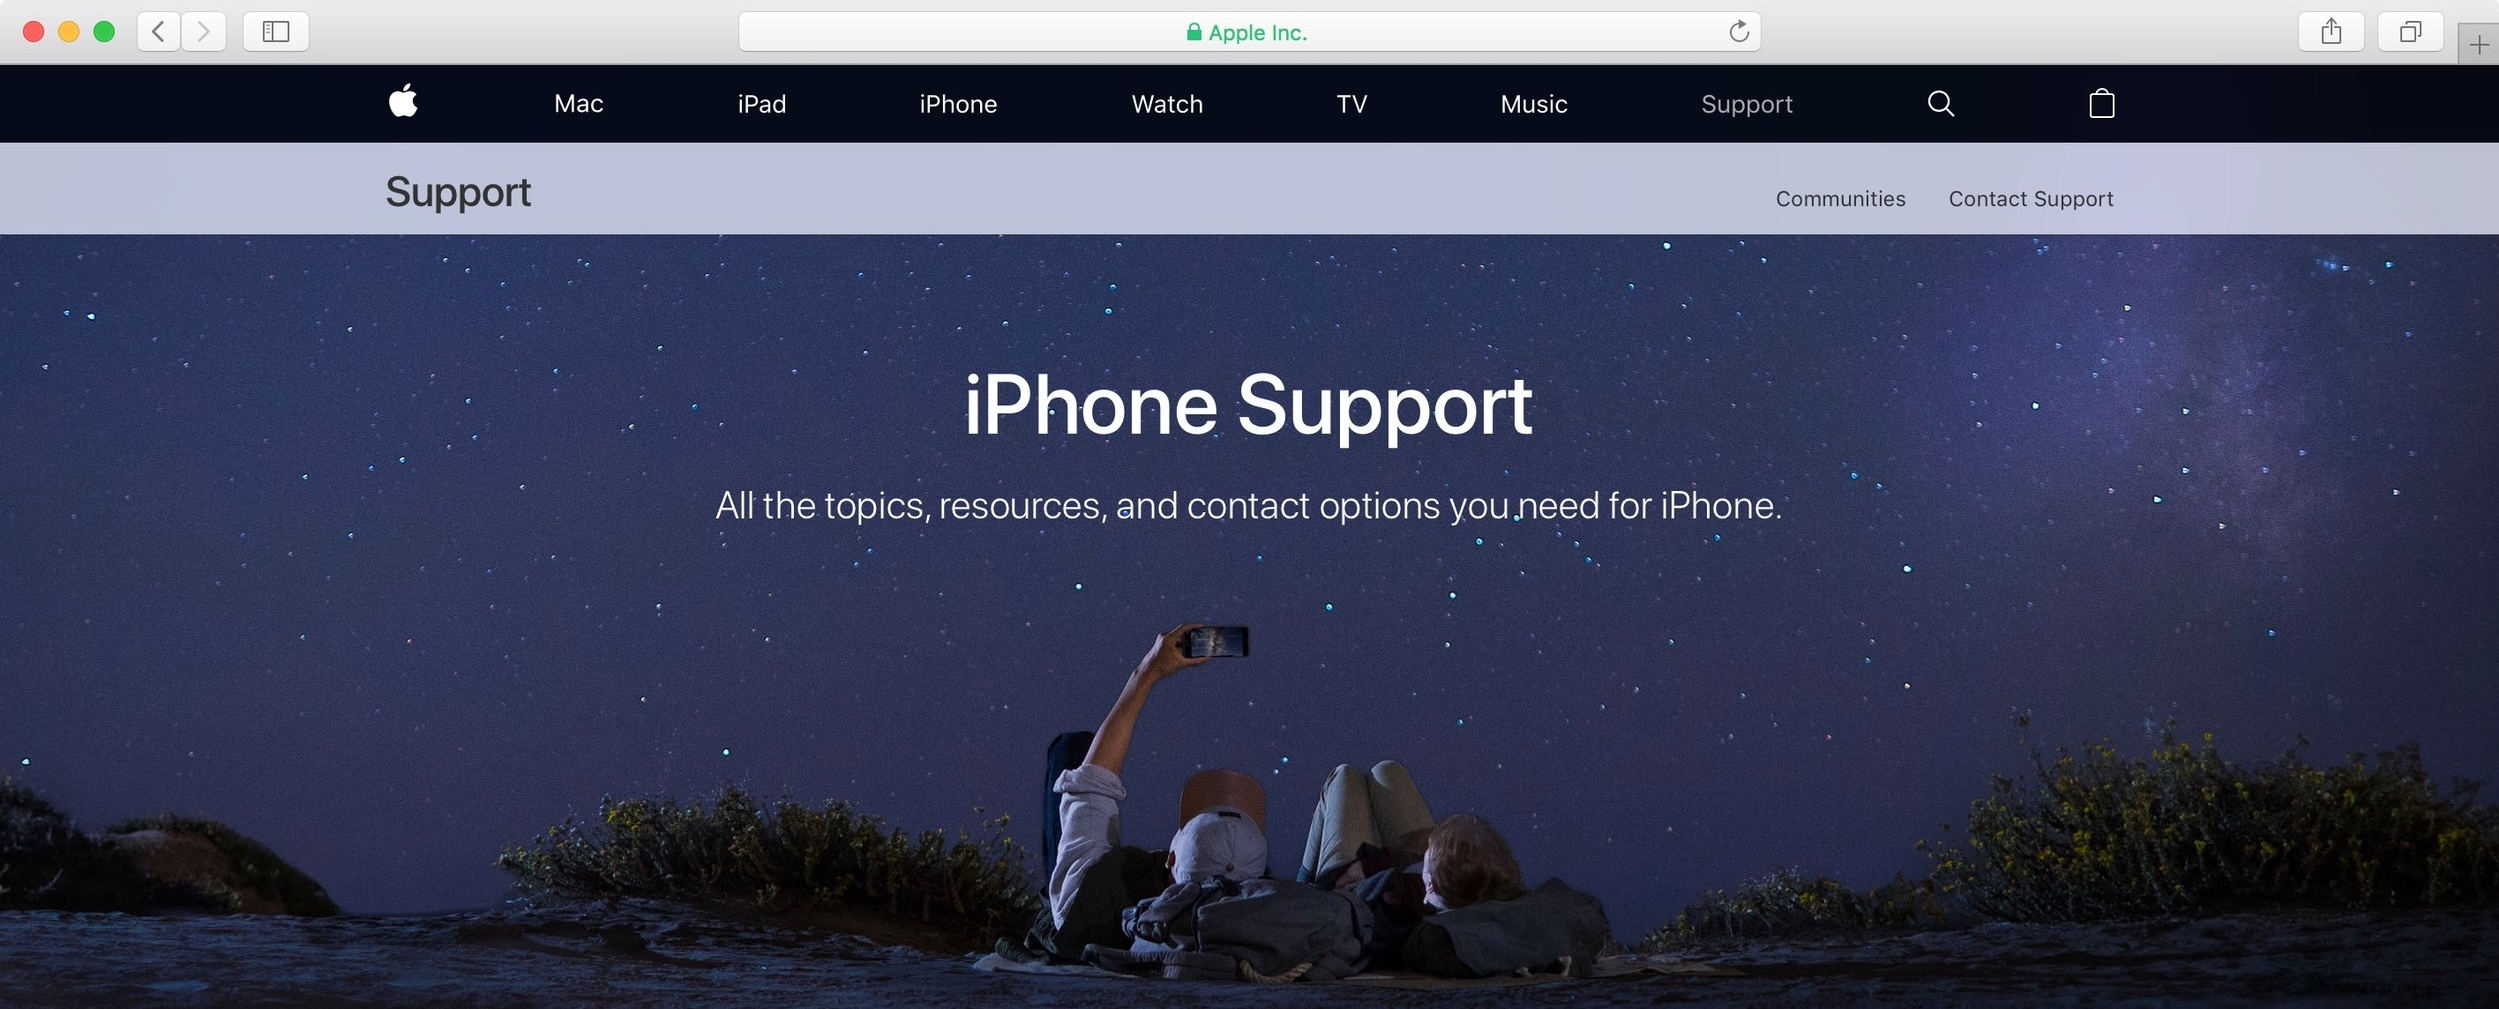 iPhoneStargazing.jpeg